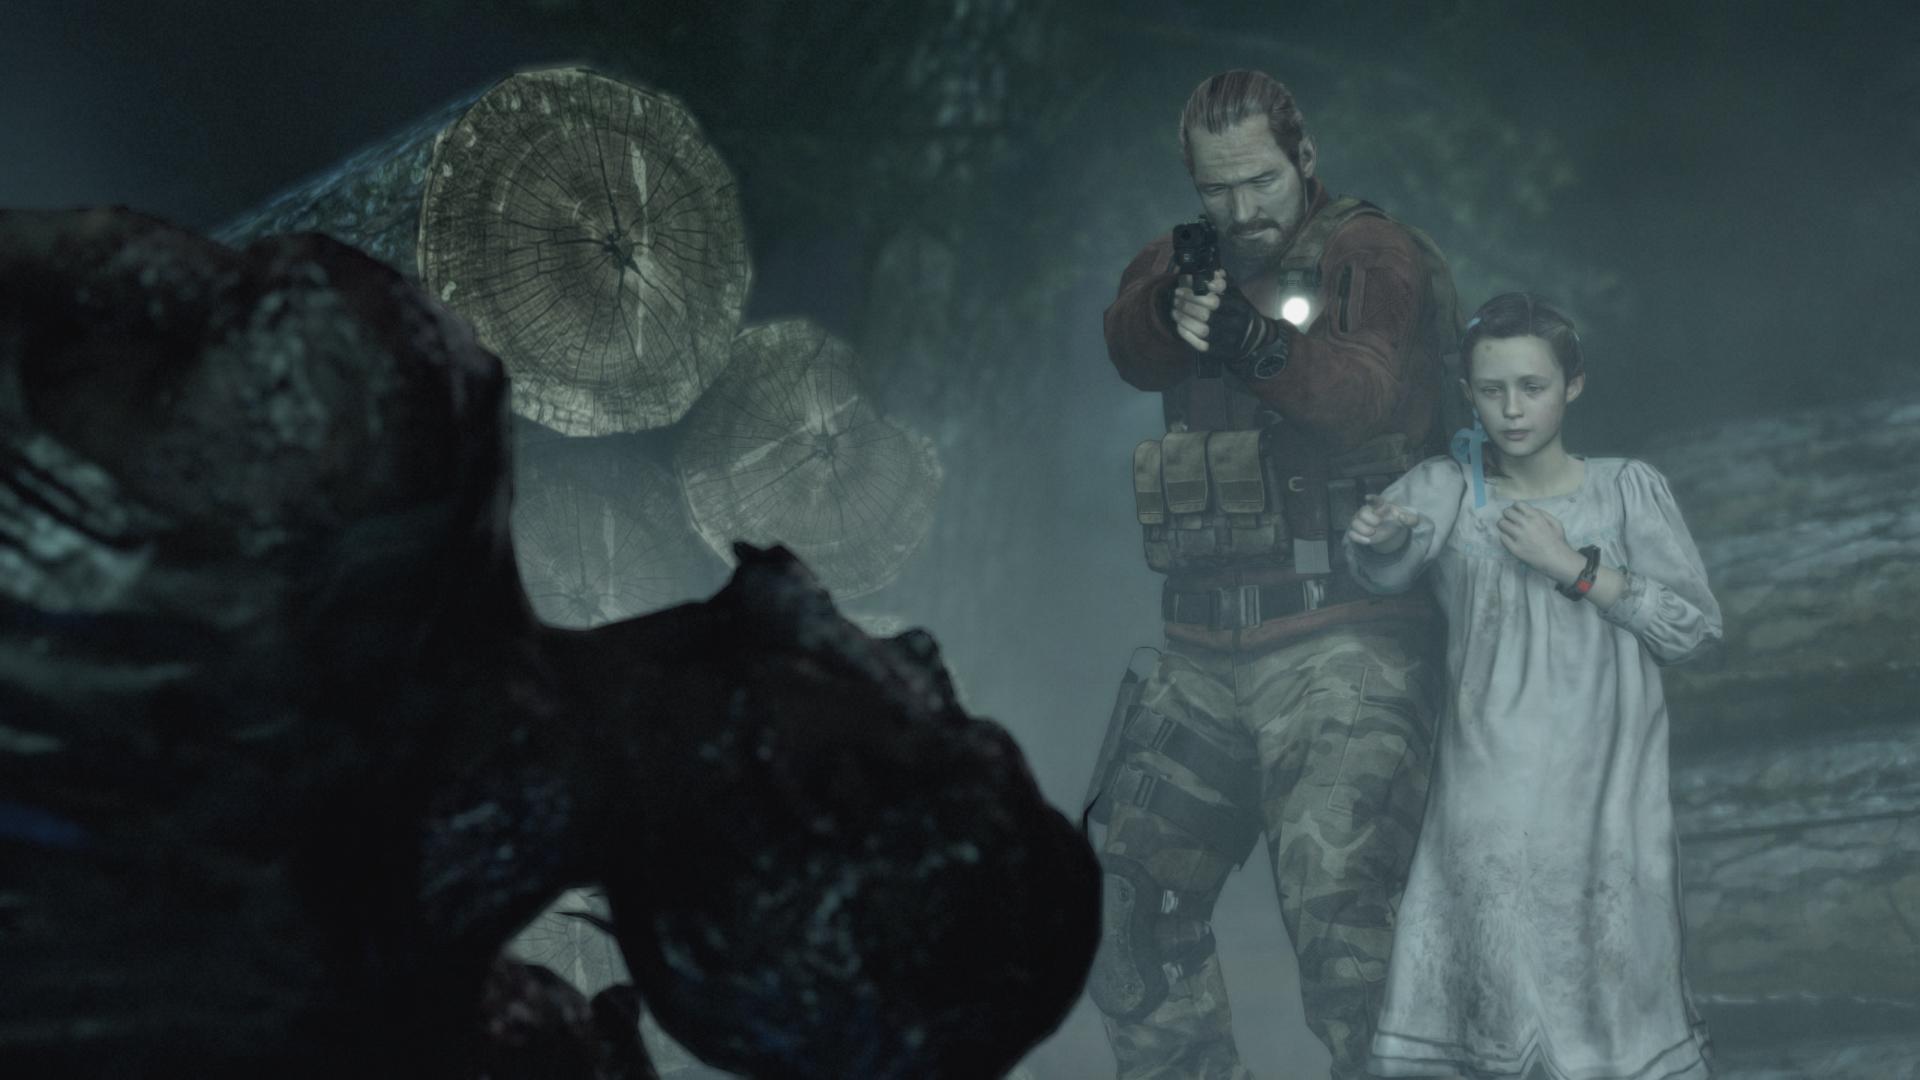 Resident Evil Revelations 2 ESPAÑOL PC Full + Update 2.1 (CODEX) + REPACK 3 DVD5 (JPW) 6